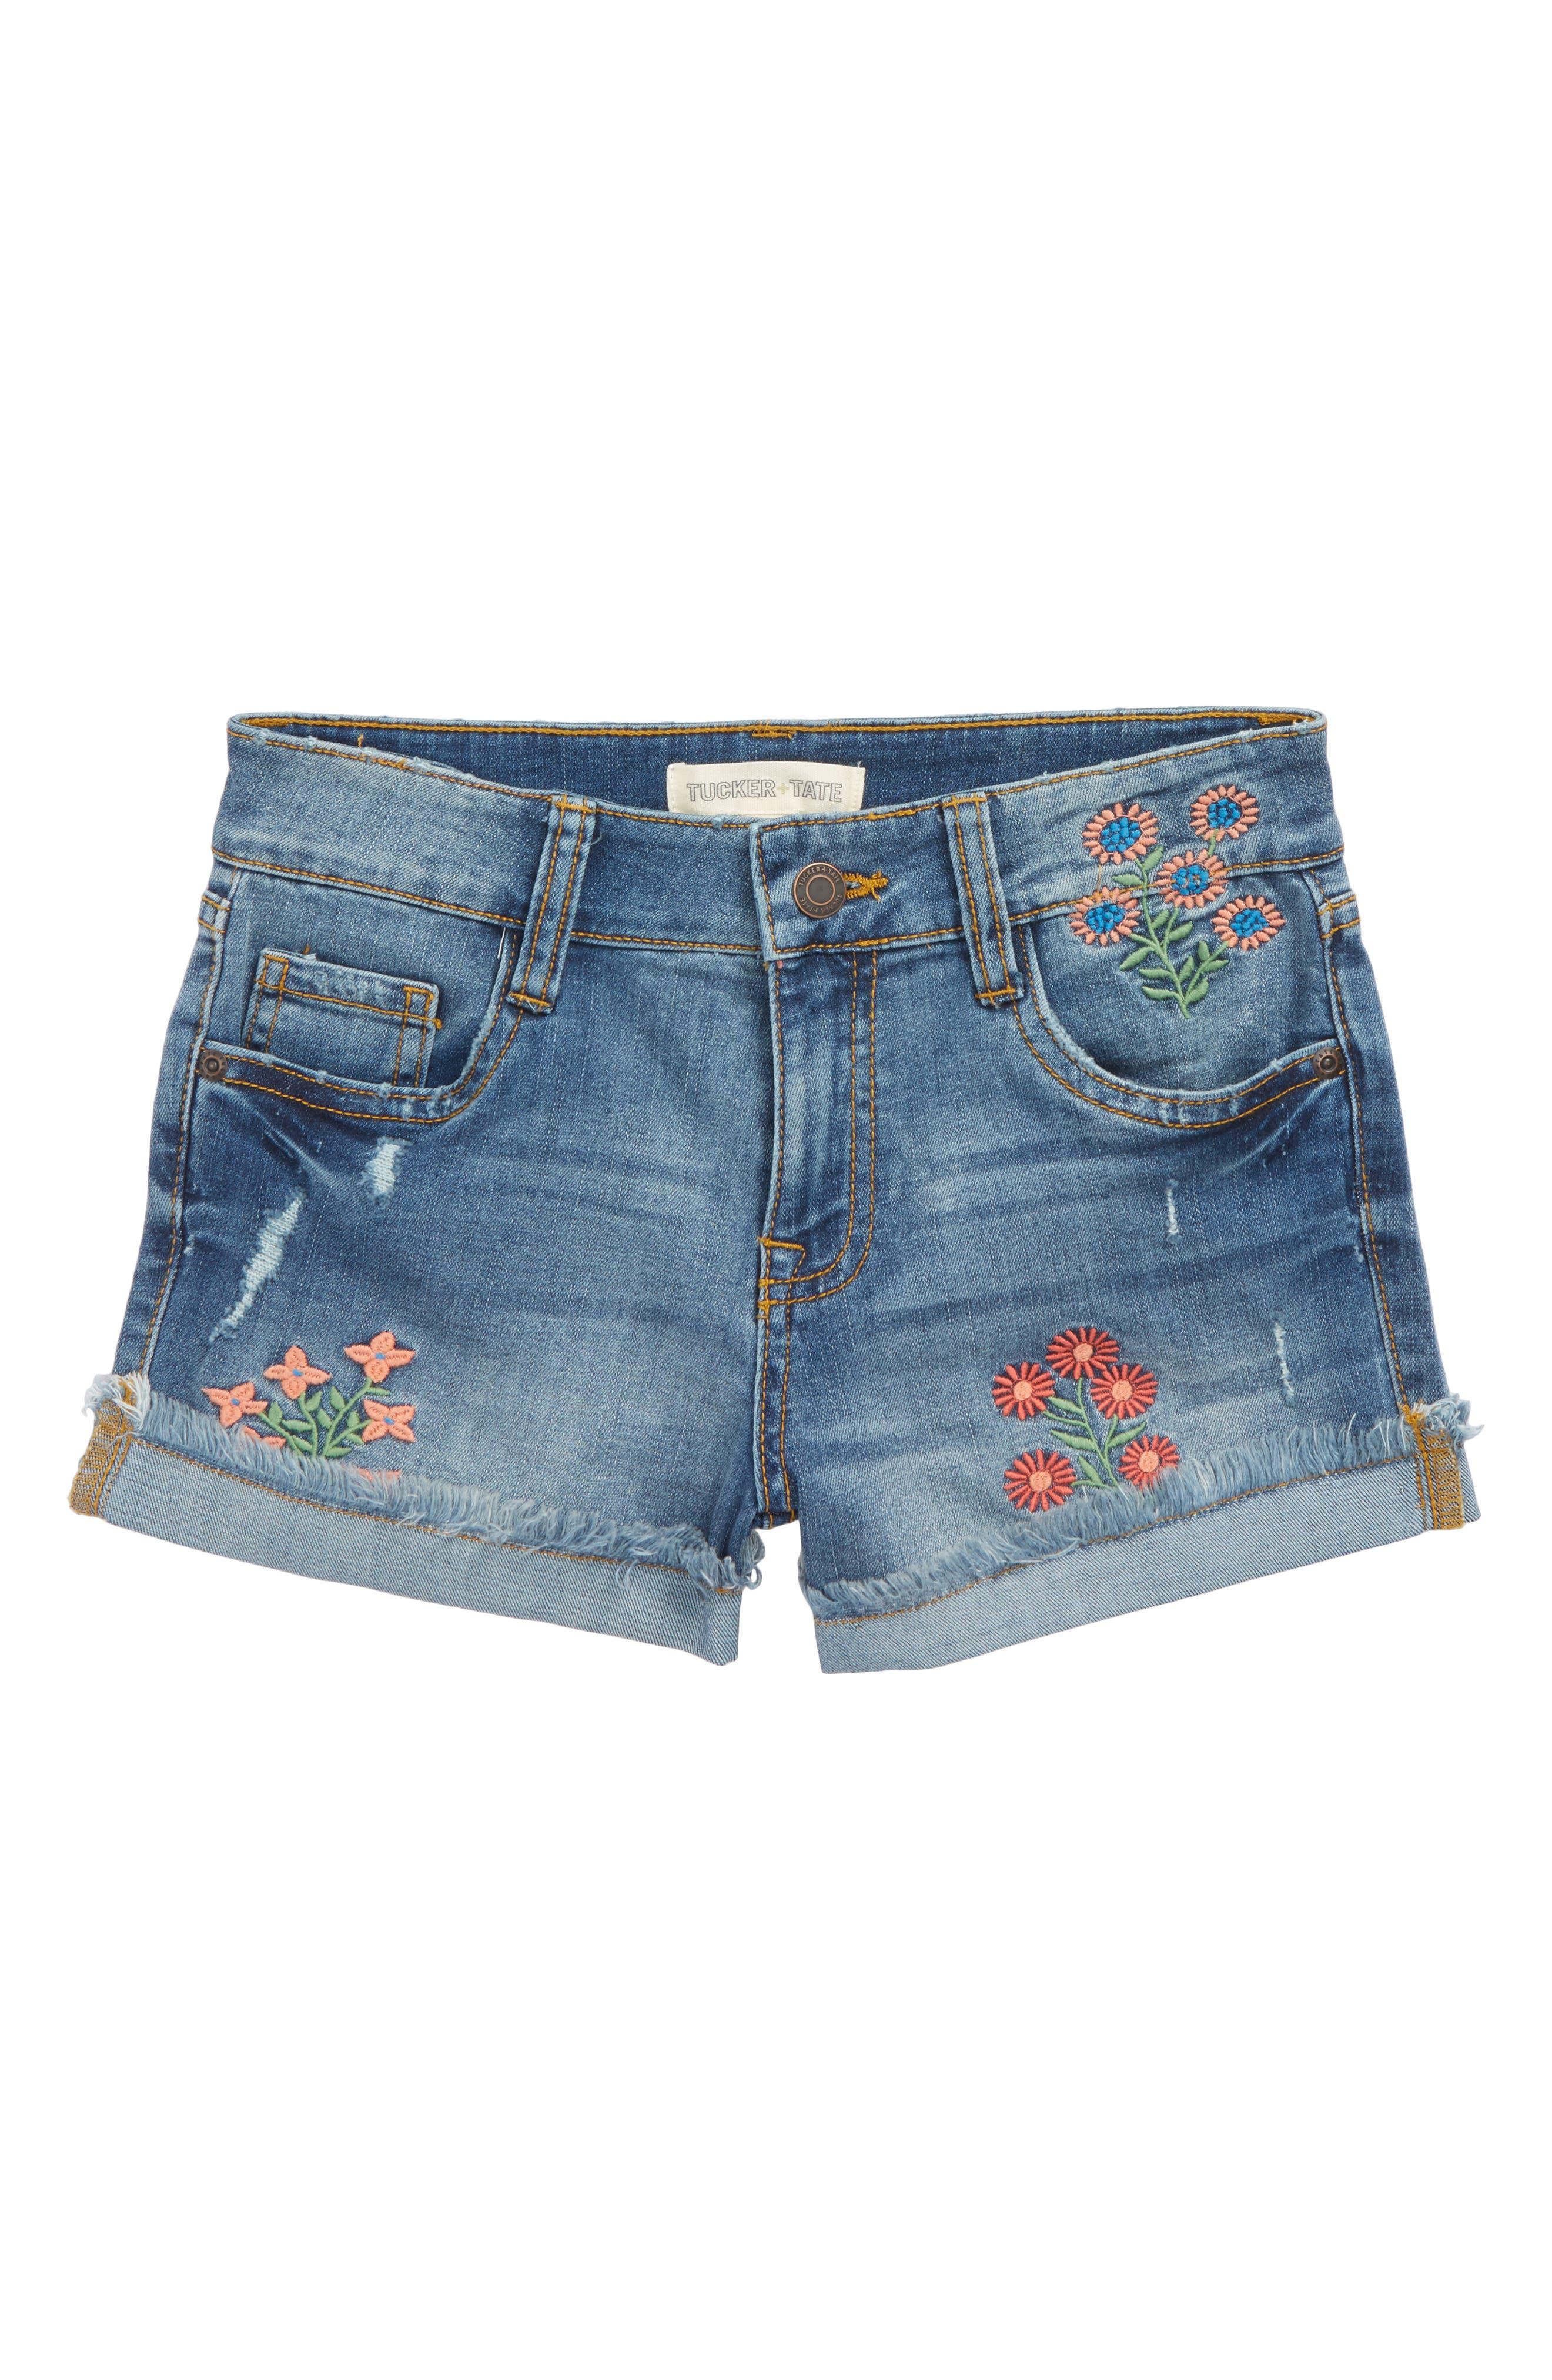 Main Image - Tucker + Tate Flower Embroidered Denim Shorts (Big Girls)